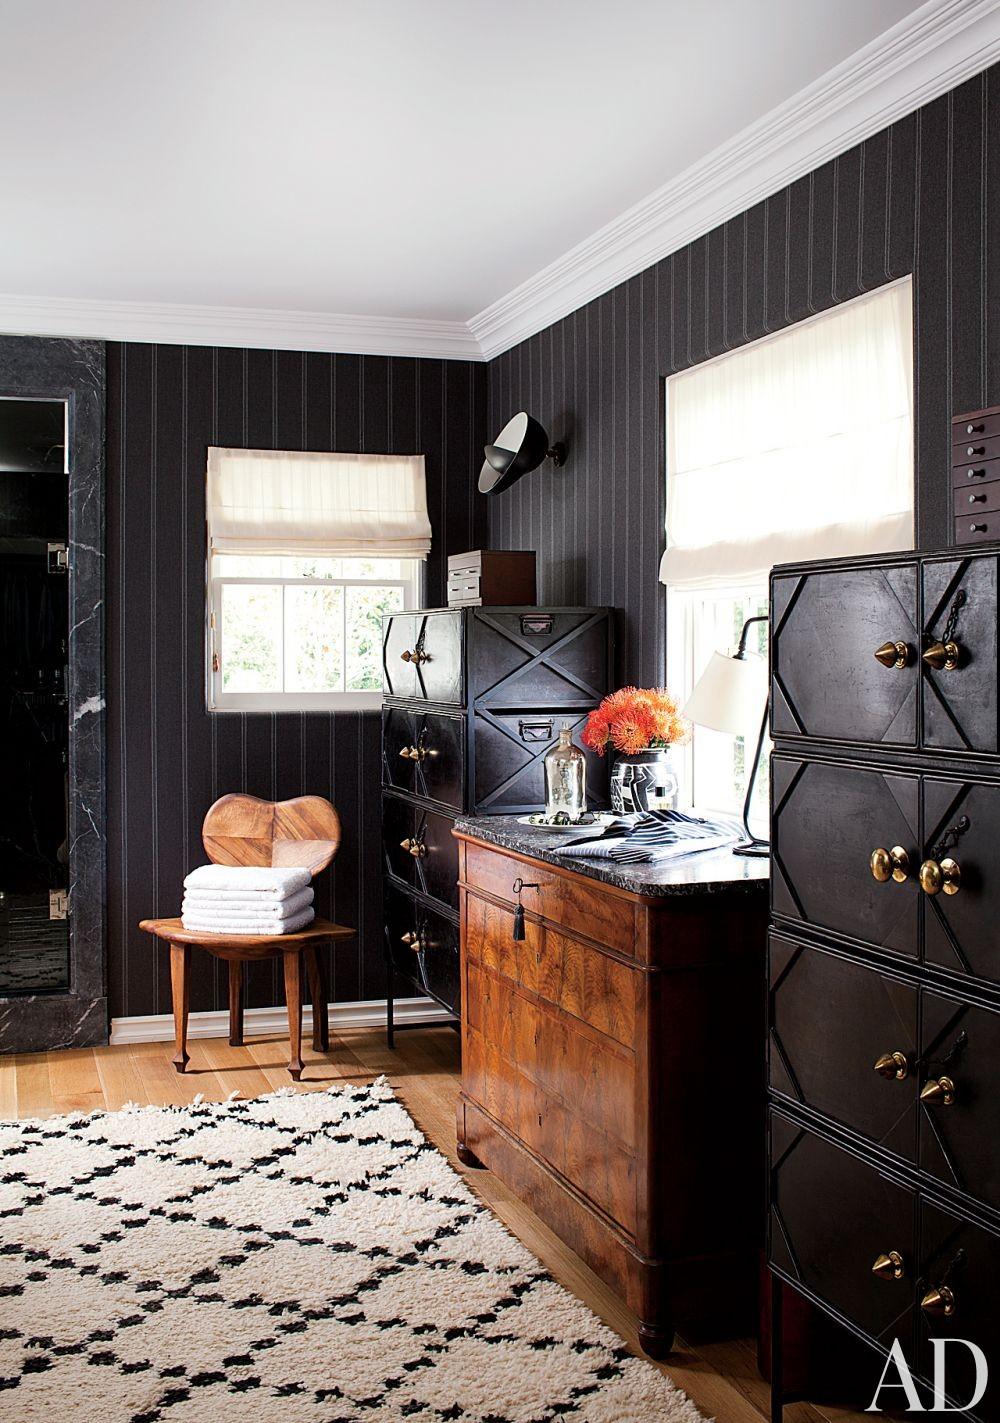 Contemporary Dressing Room/Closet by Trip Haenisch & Associates in Bel Air, California